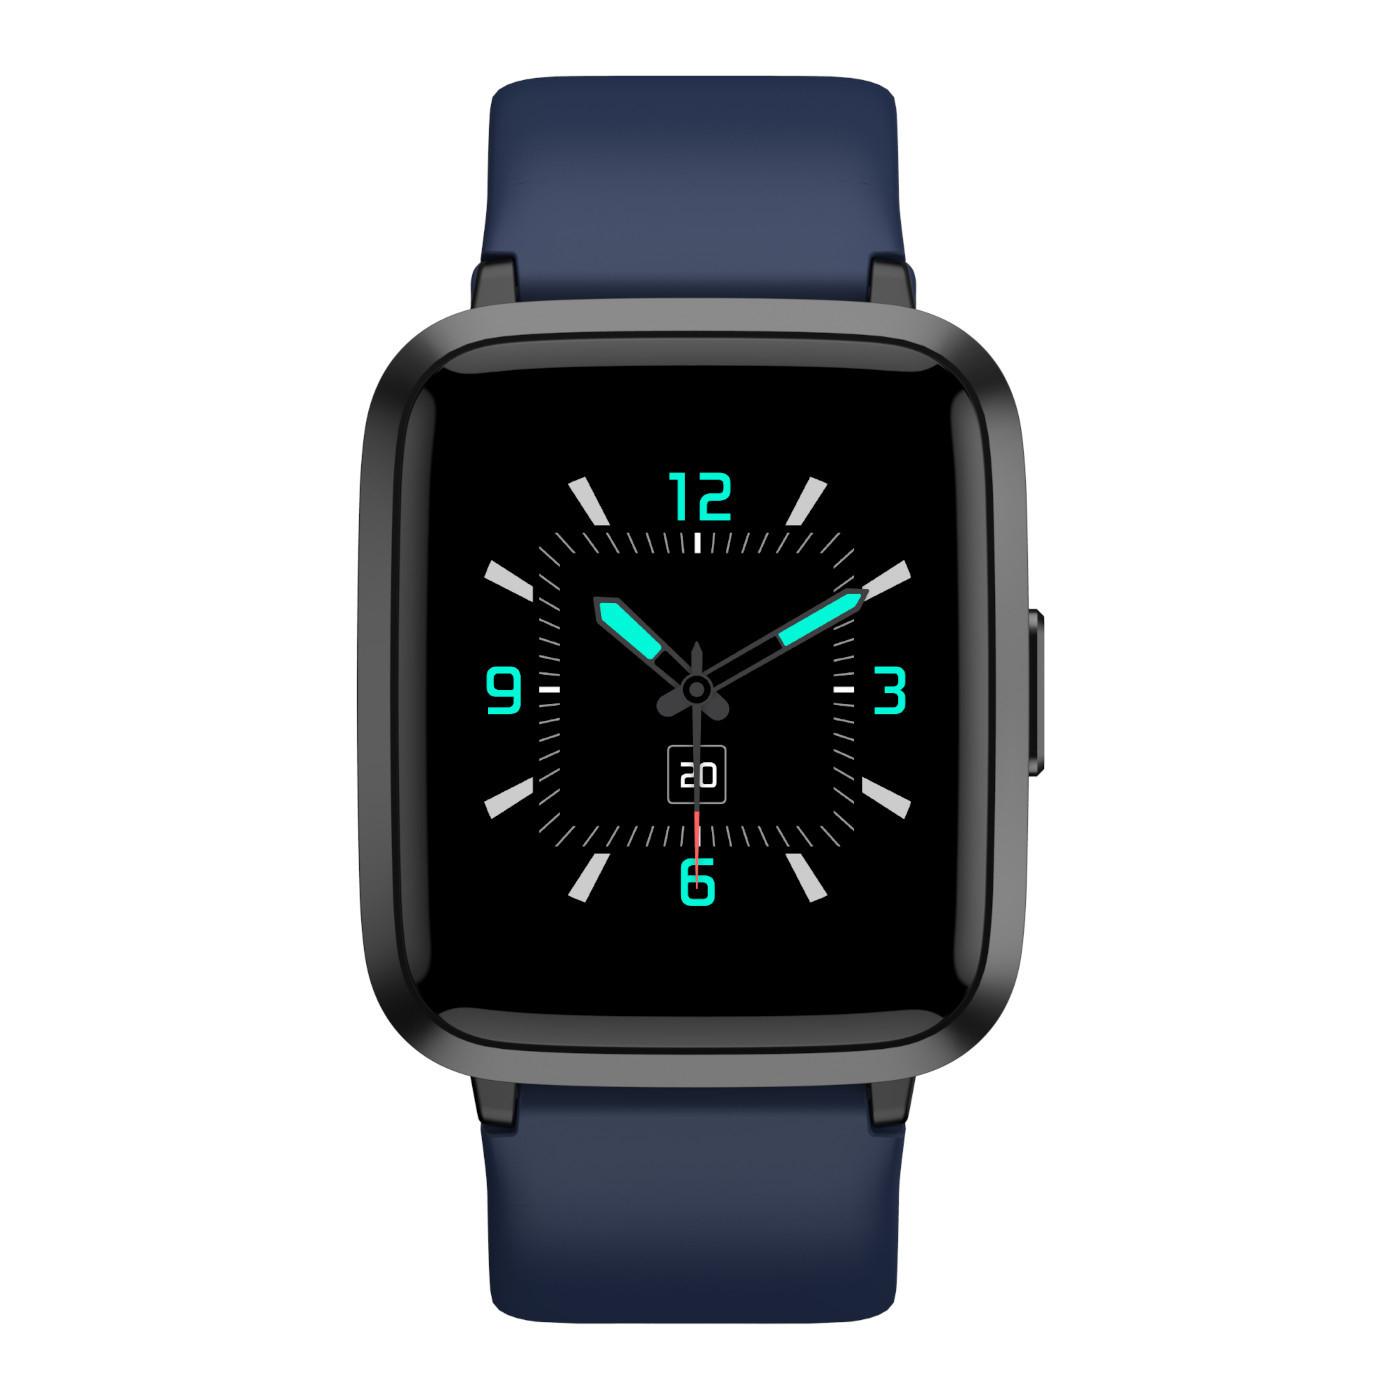 Smartwatch Trends Blauw Display Smartwatch S205U-2